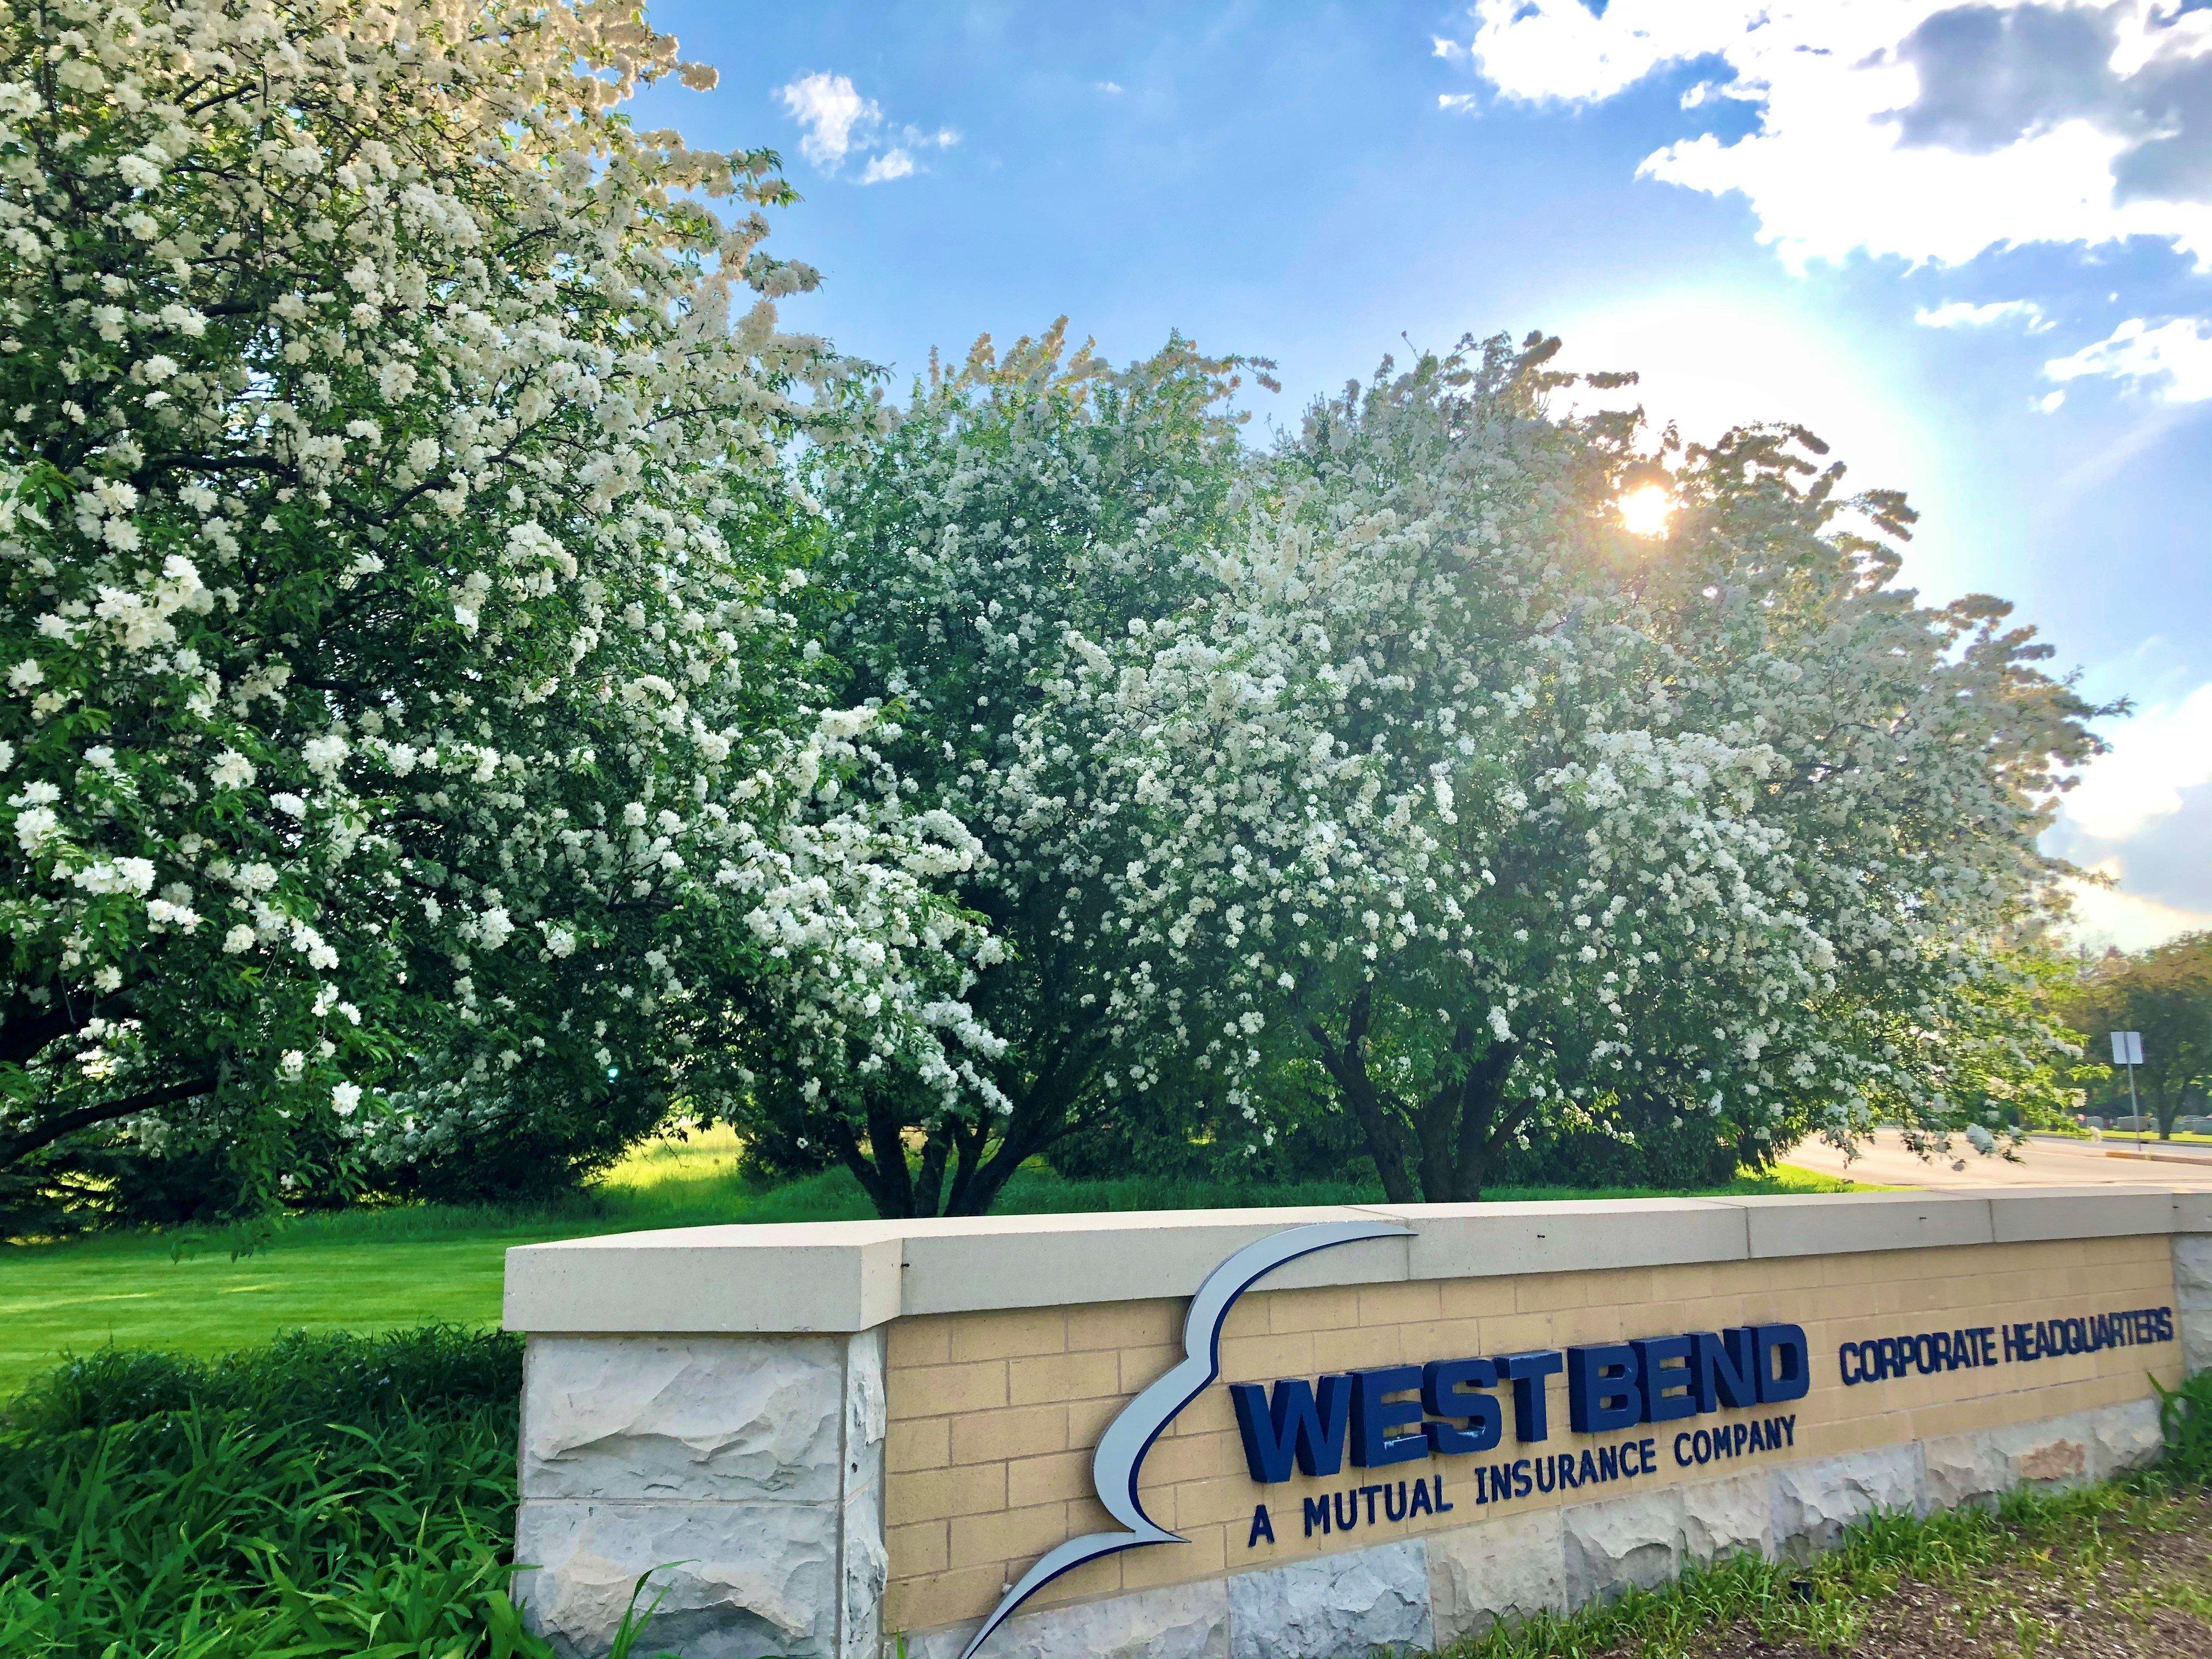 WB sign flowering tree